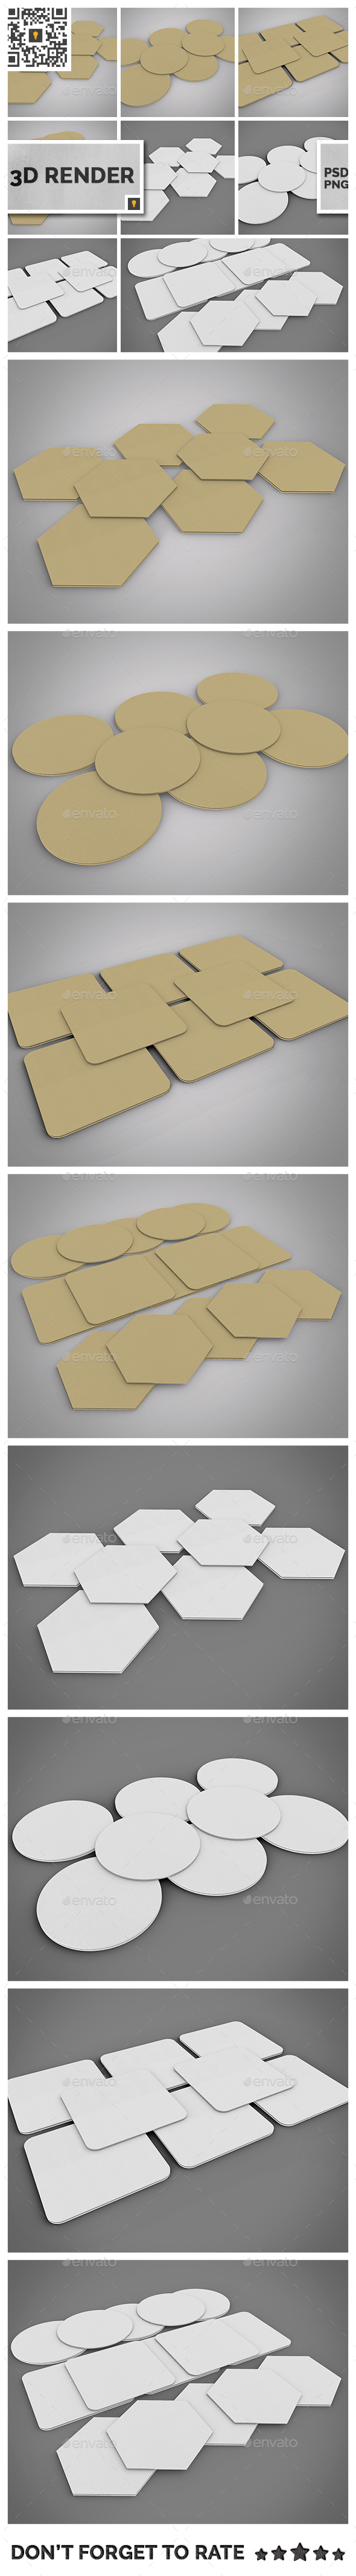 Paper Coaster 3D Render - Miscellaneous 3D Renders